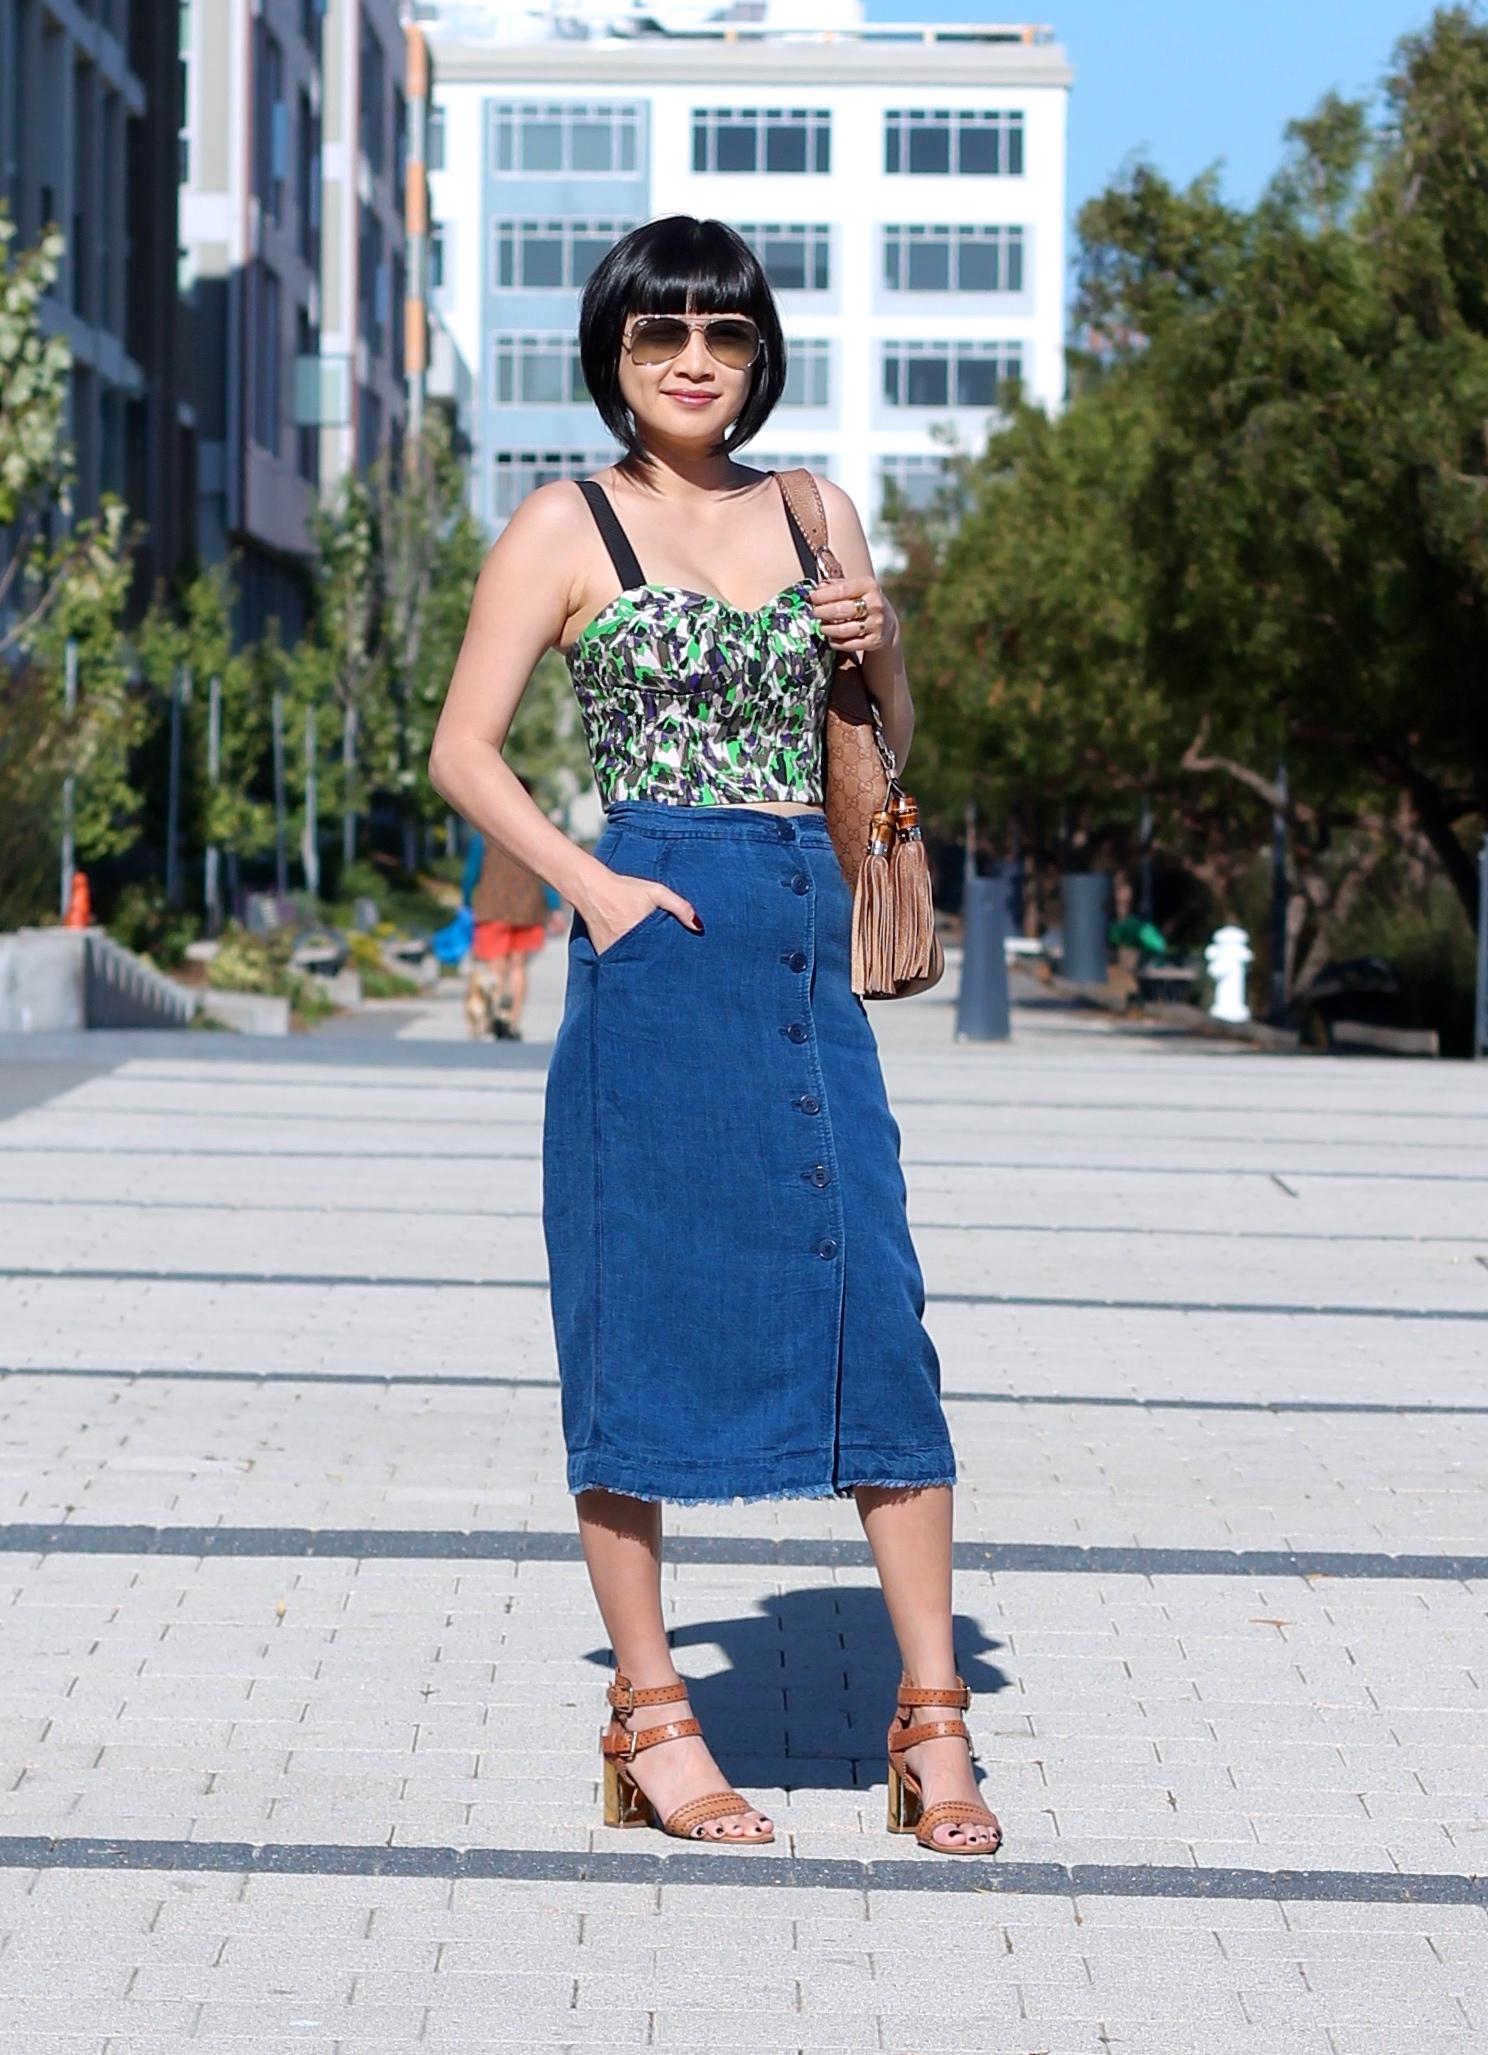 Club Monaco top, Aritzia skirt, Dolce Vita shoes, Gucci bag